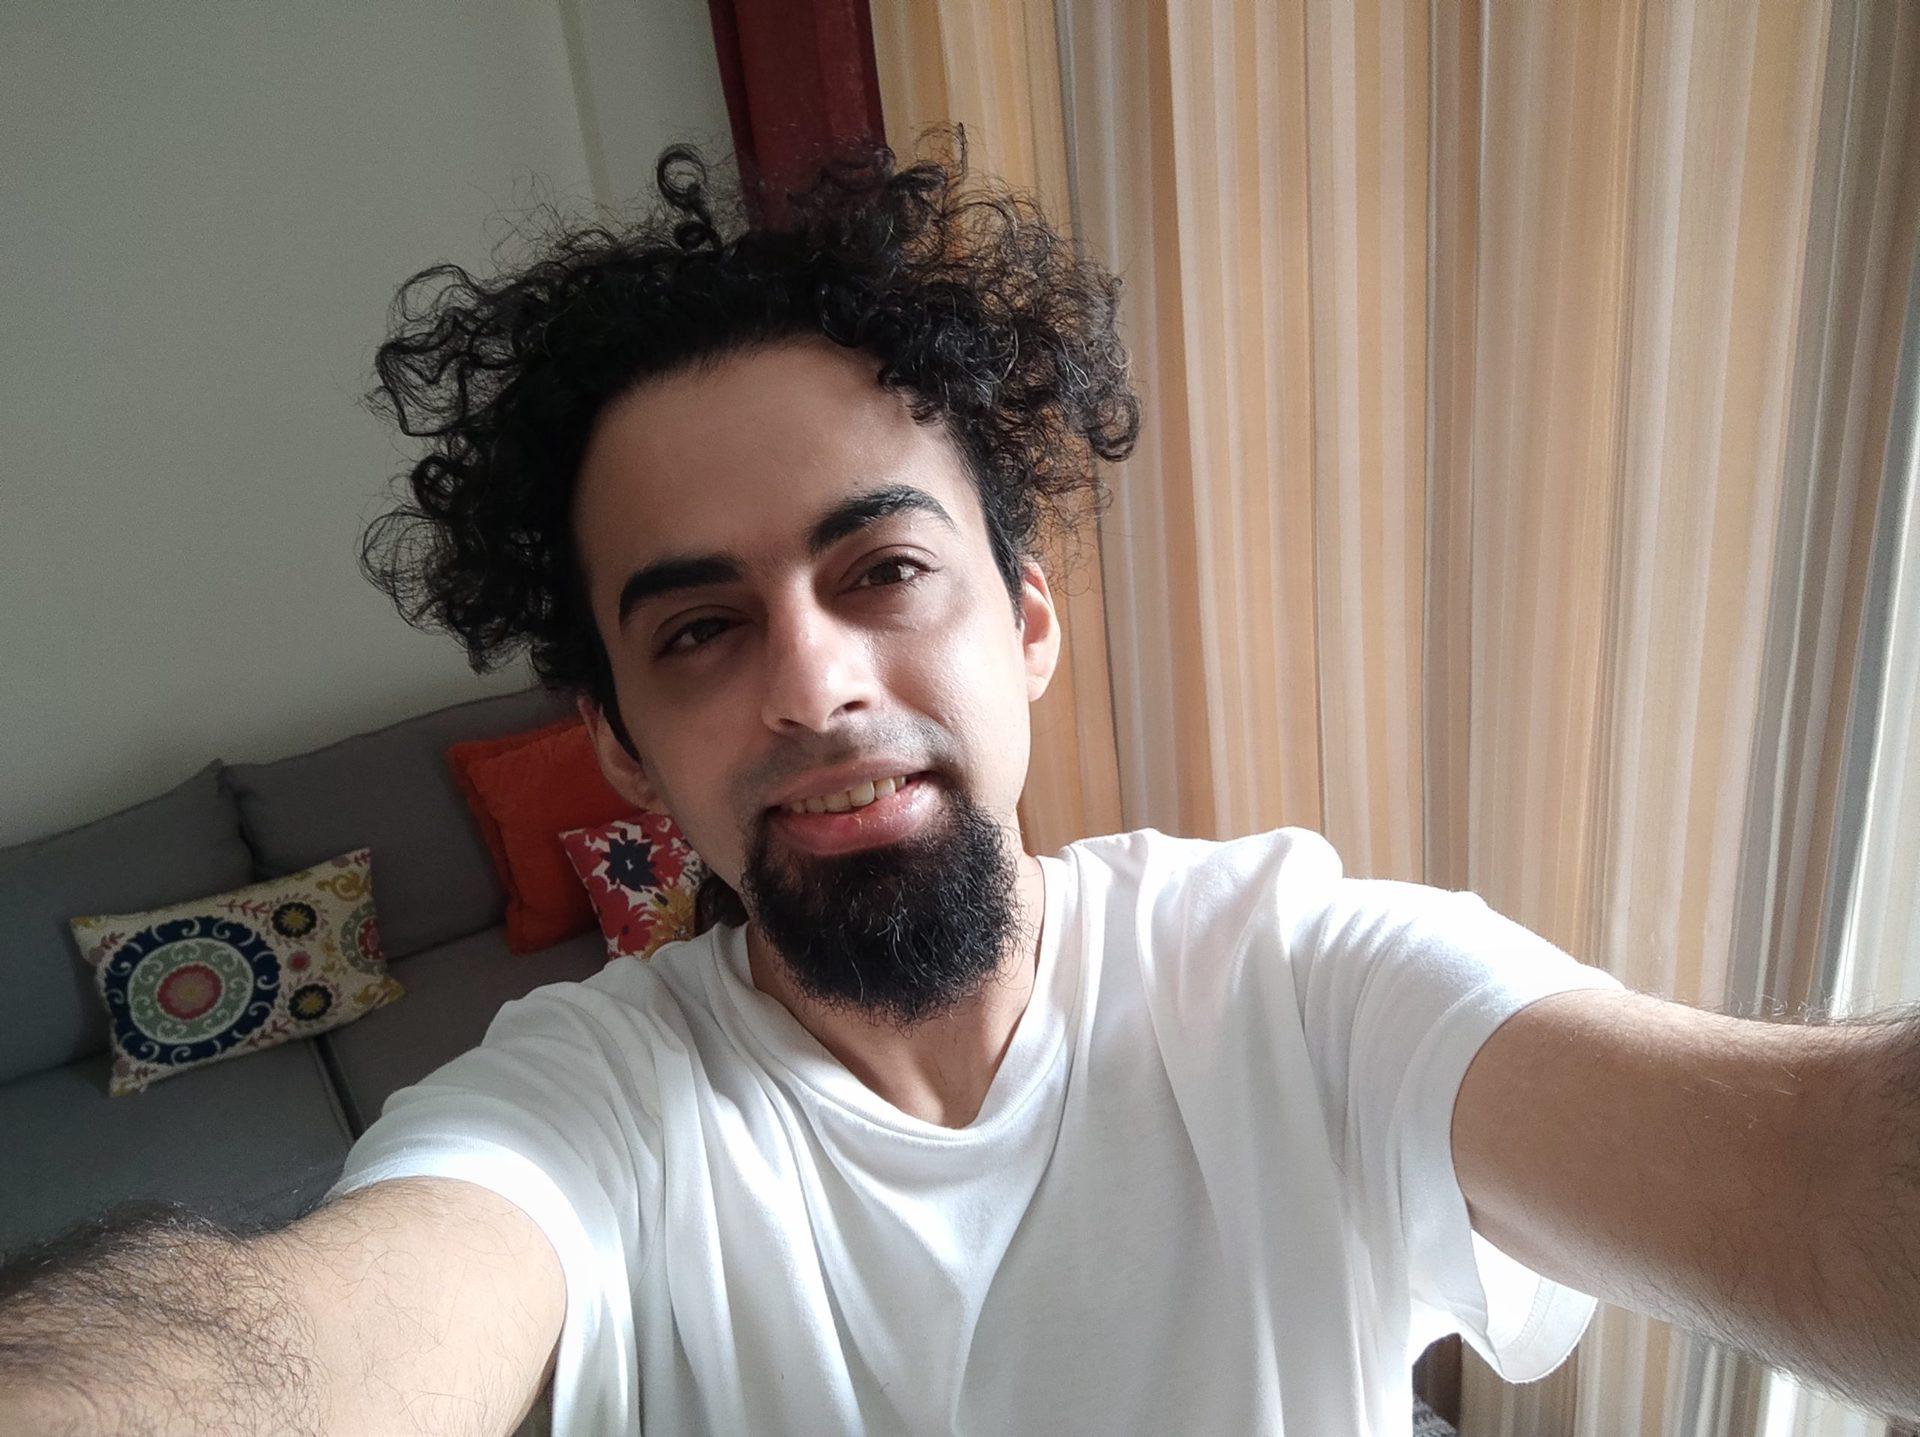 Mi 11 Ultra camera sample selfie